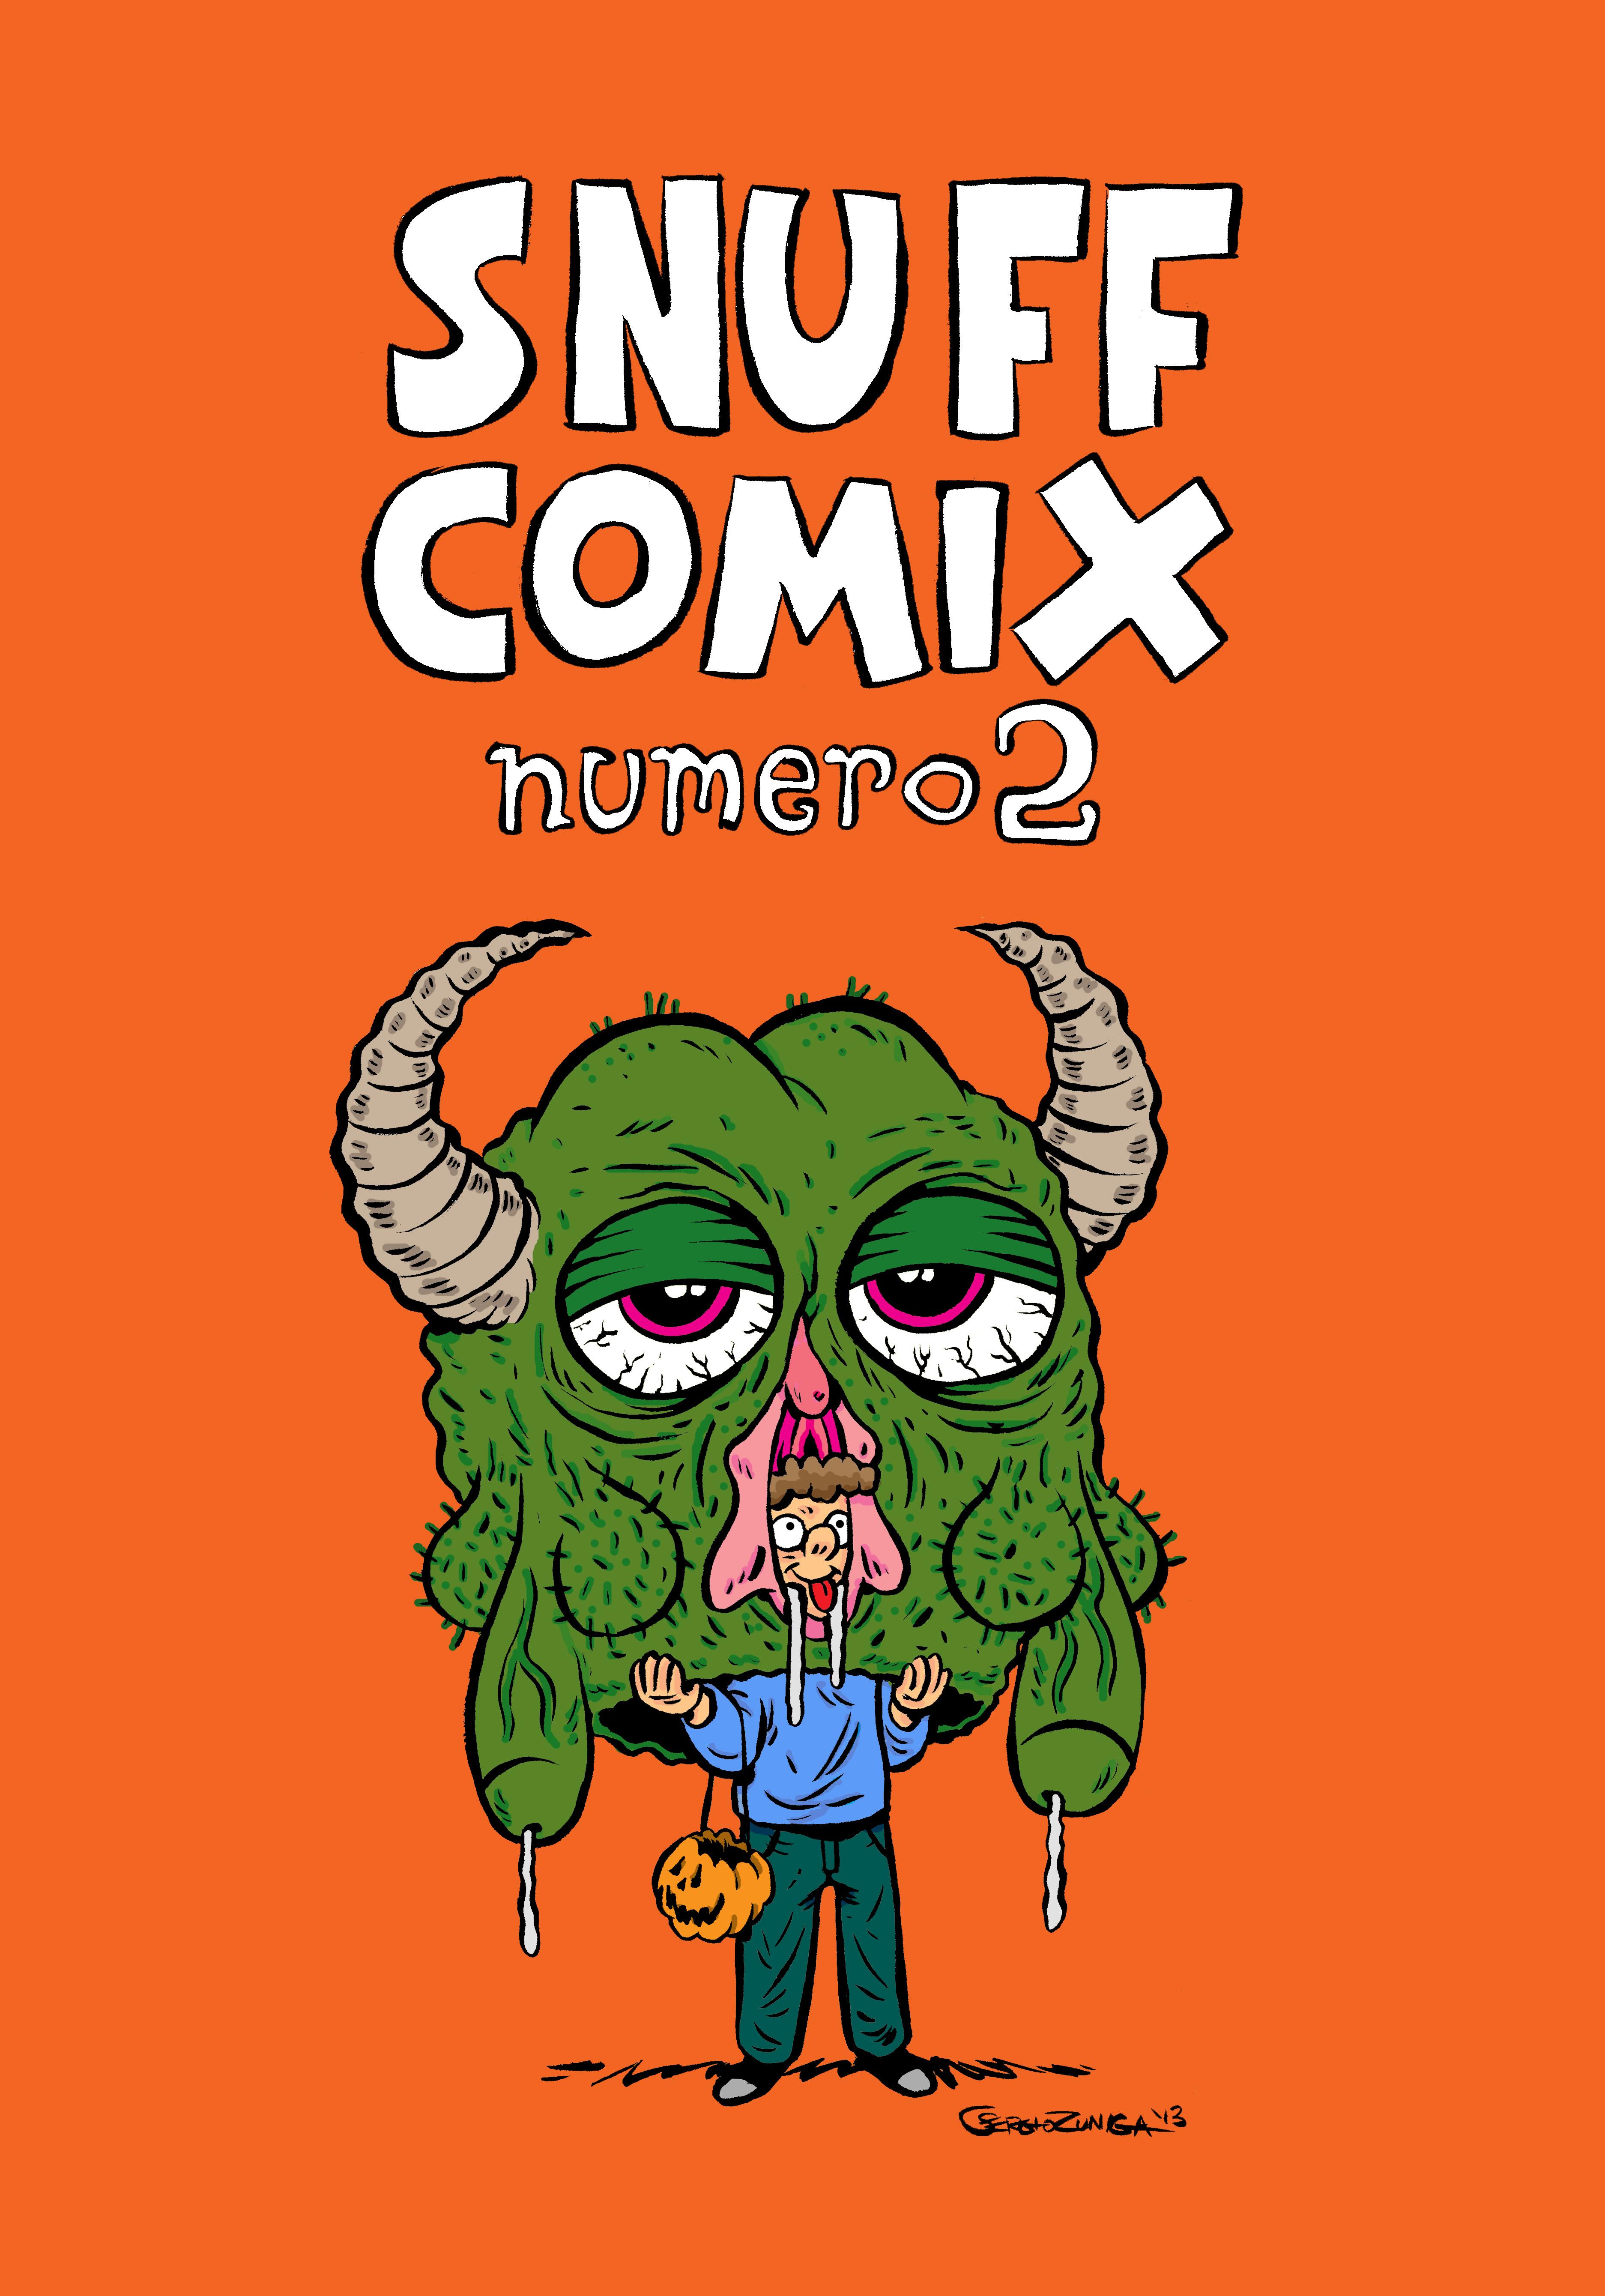 Snuff Comix#2